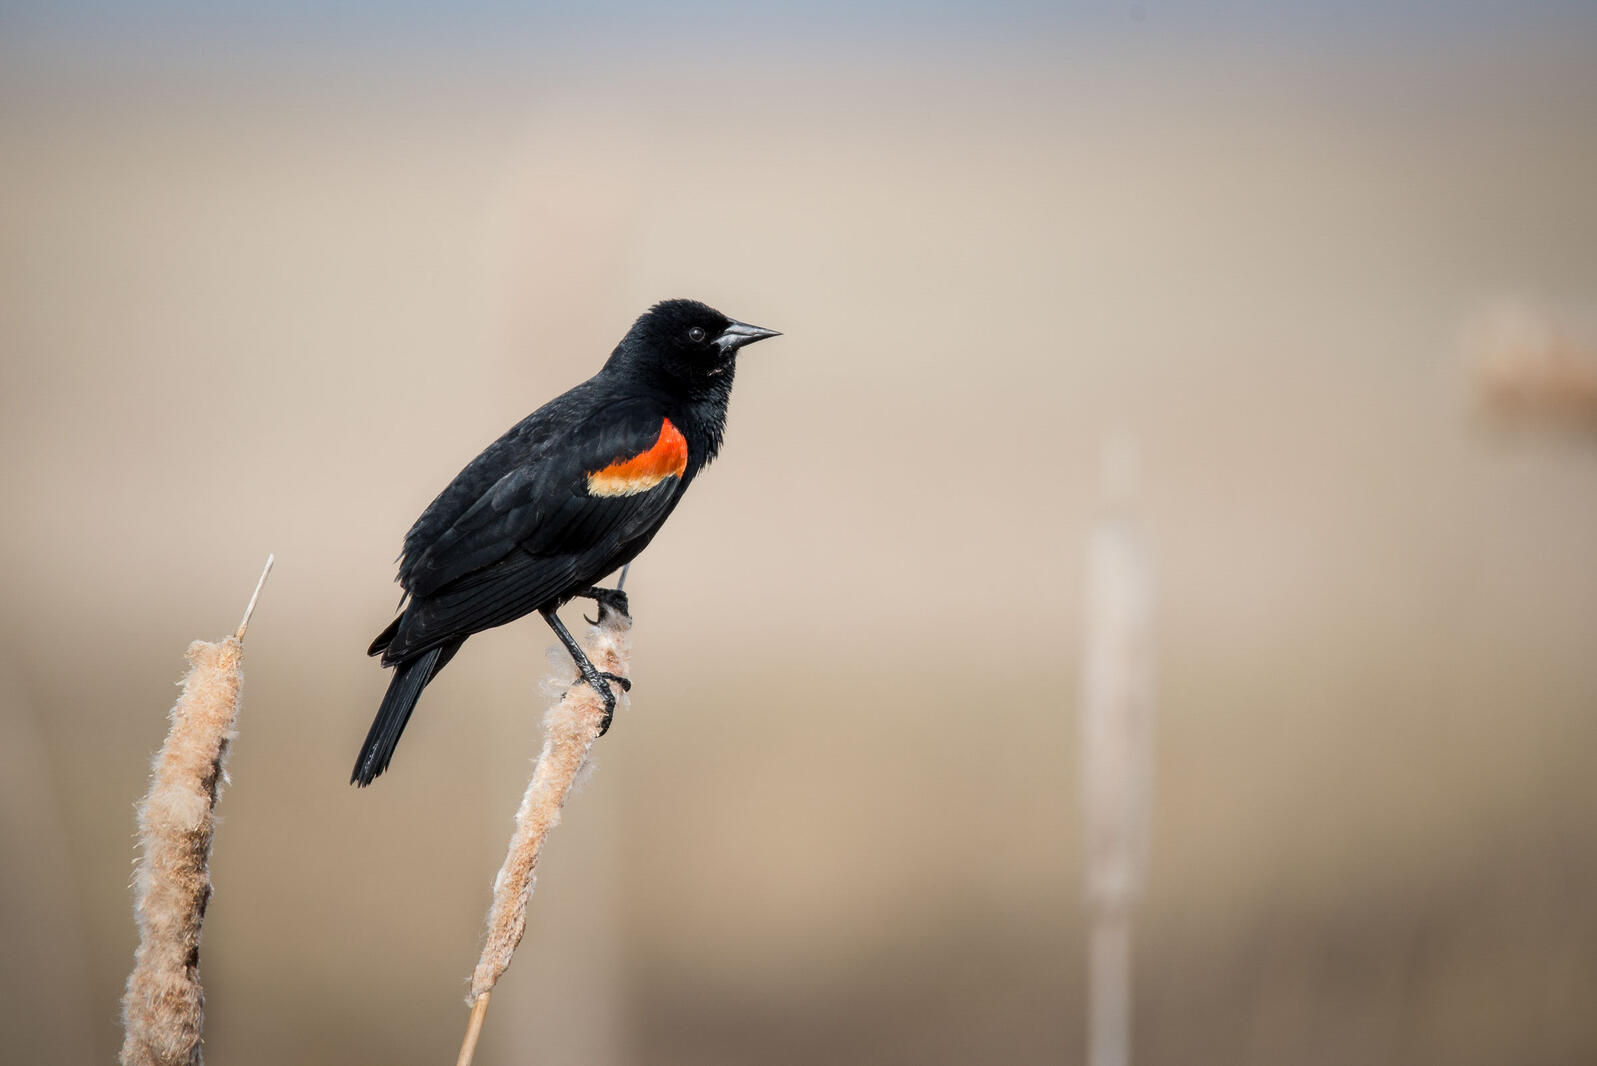 Red-winged Blackbird. Cathy Bennington/Audubon Photography Awards